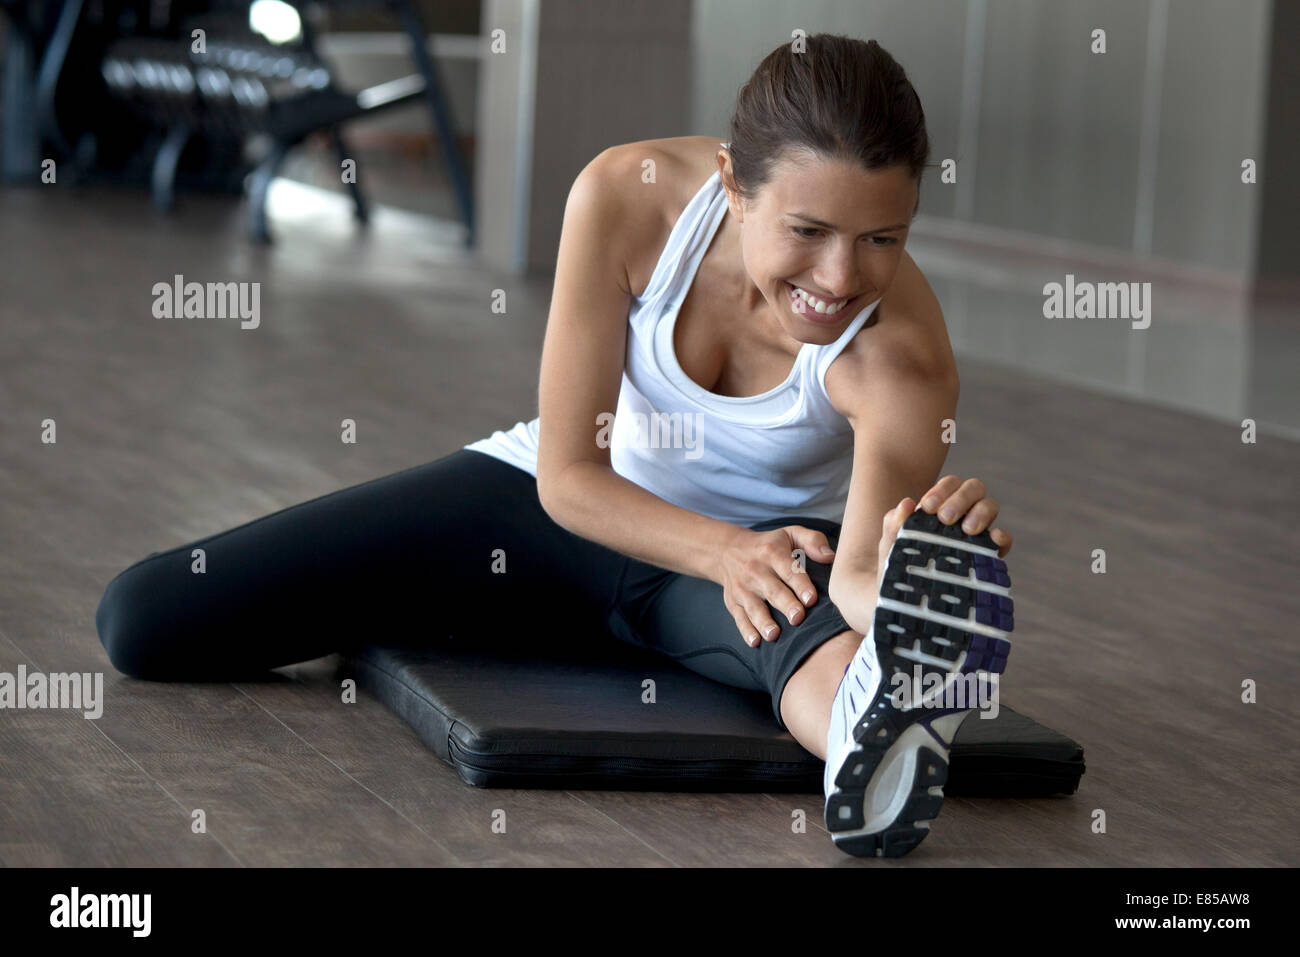 Warmup erstreckt sich Hilfe Verletzungen während des Trainings Stockbild